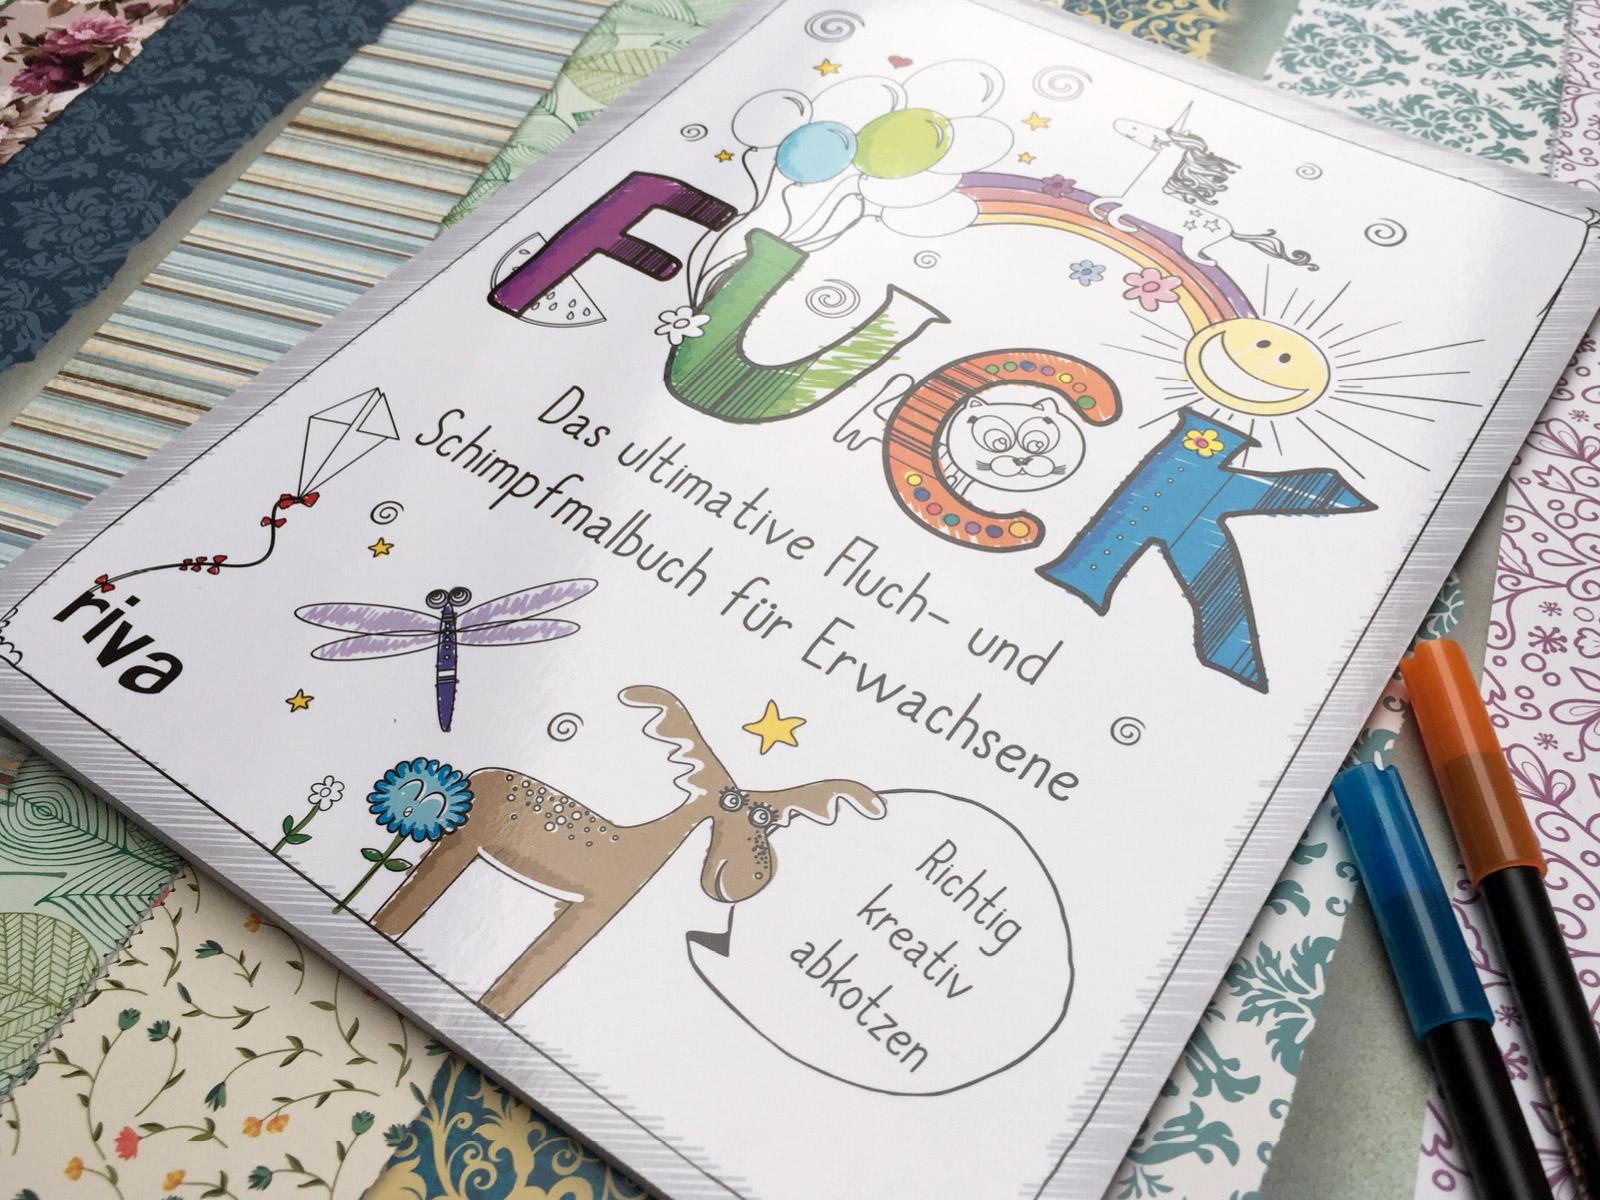 Schimpfmalbuch-FUCK-Titel